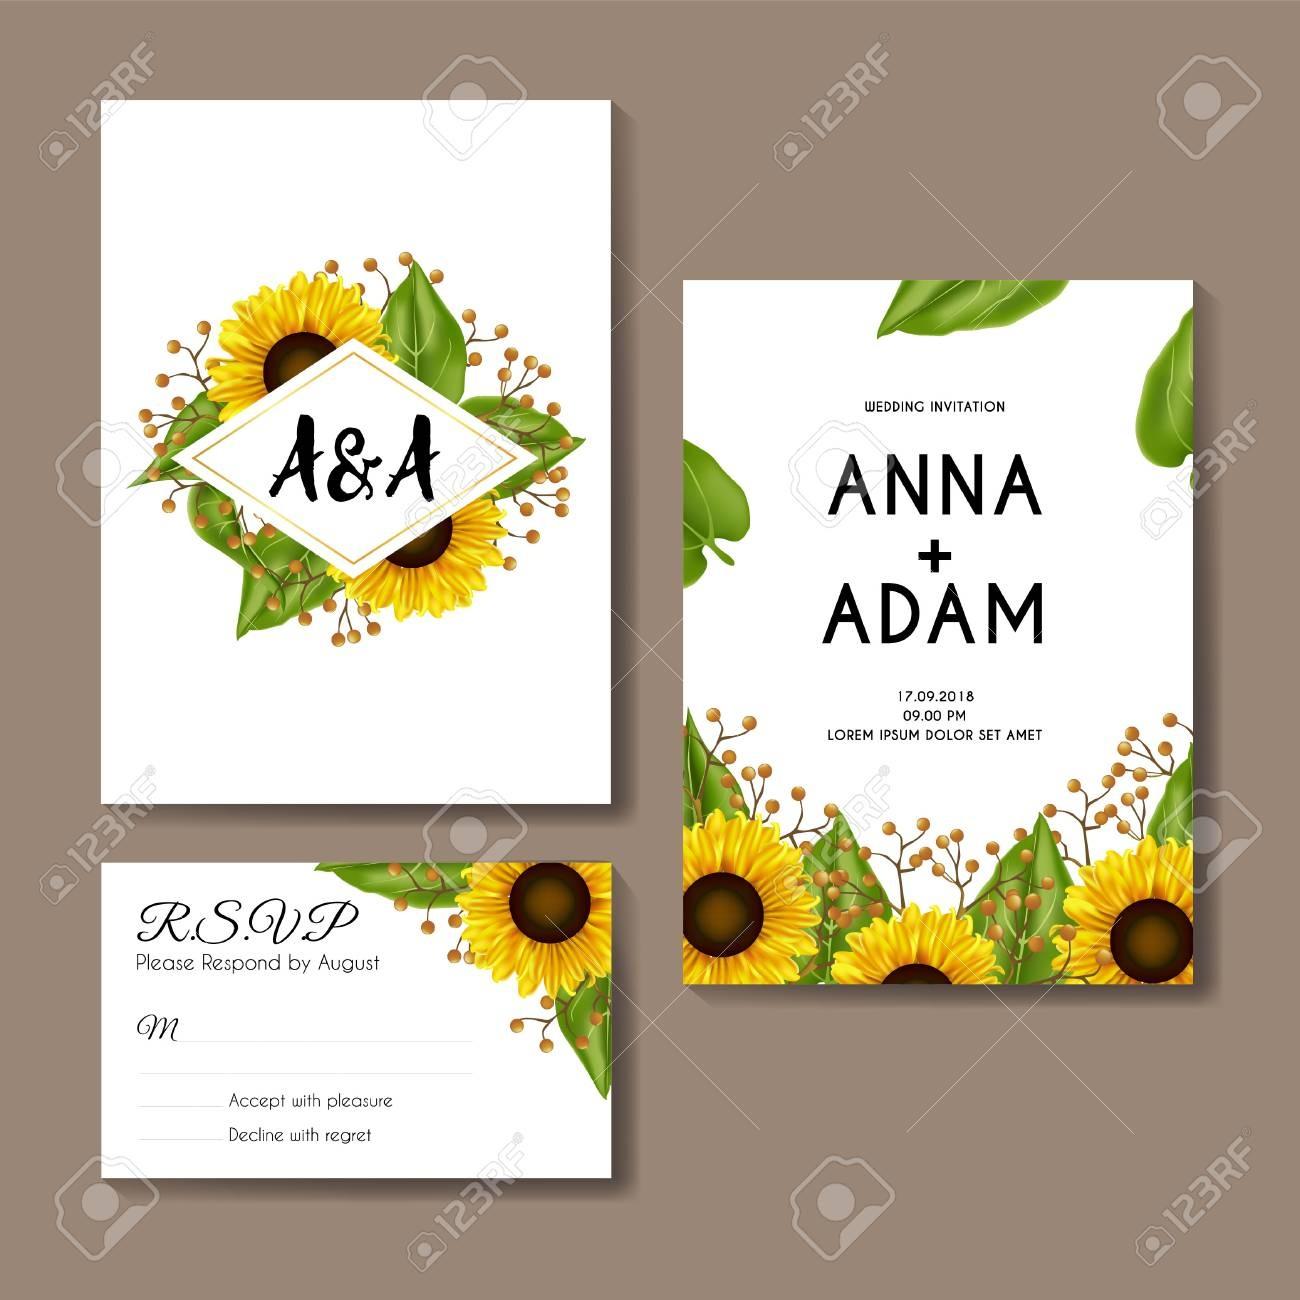 Sunflowers Wedding Invitation Card Template Design Royalty Free - Free Printable Sunflower Wedding Invitation Templates